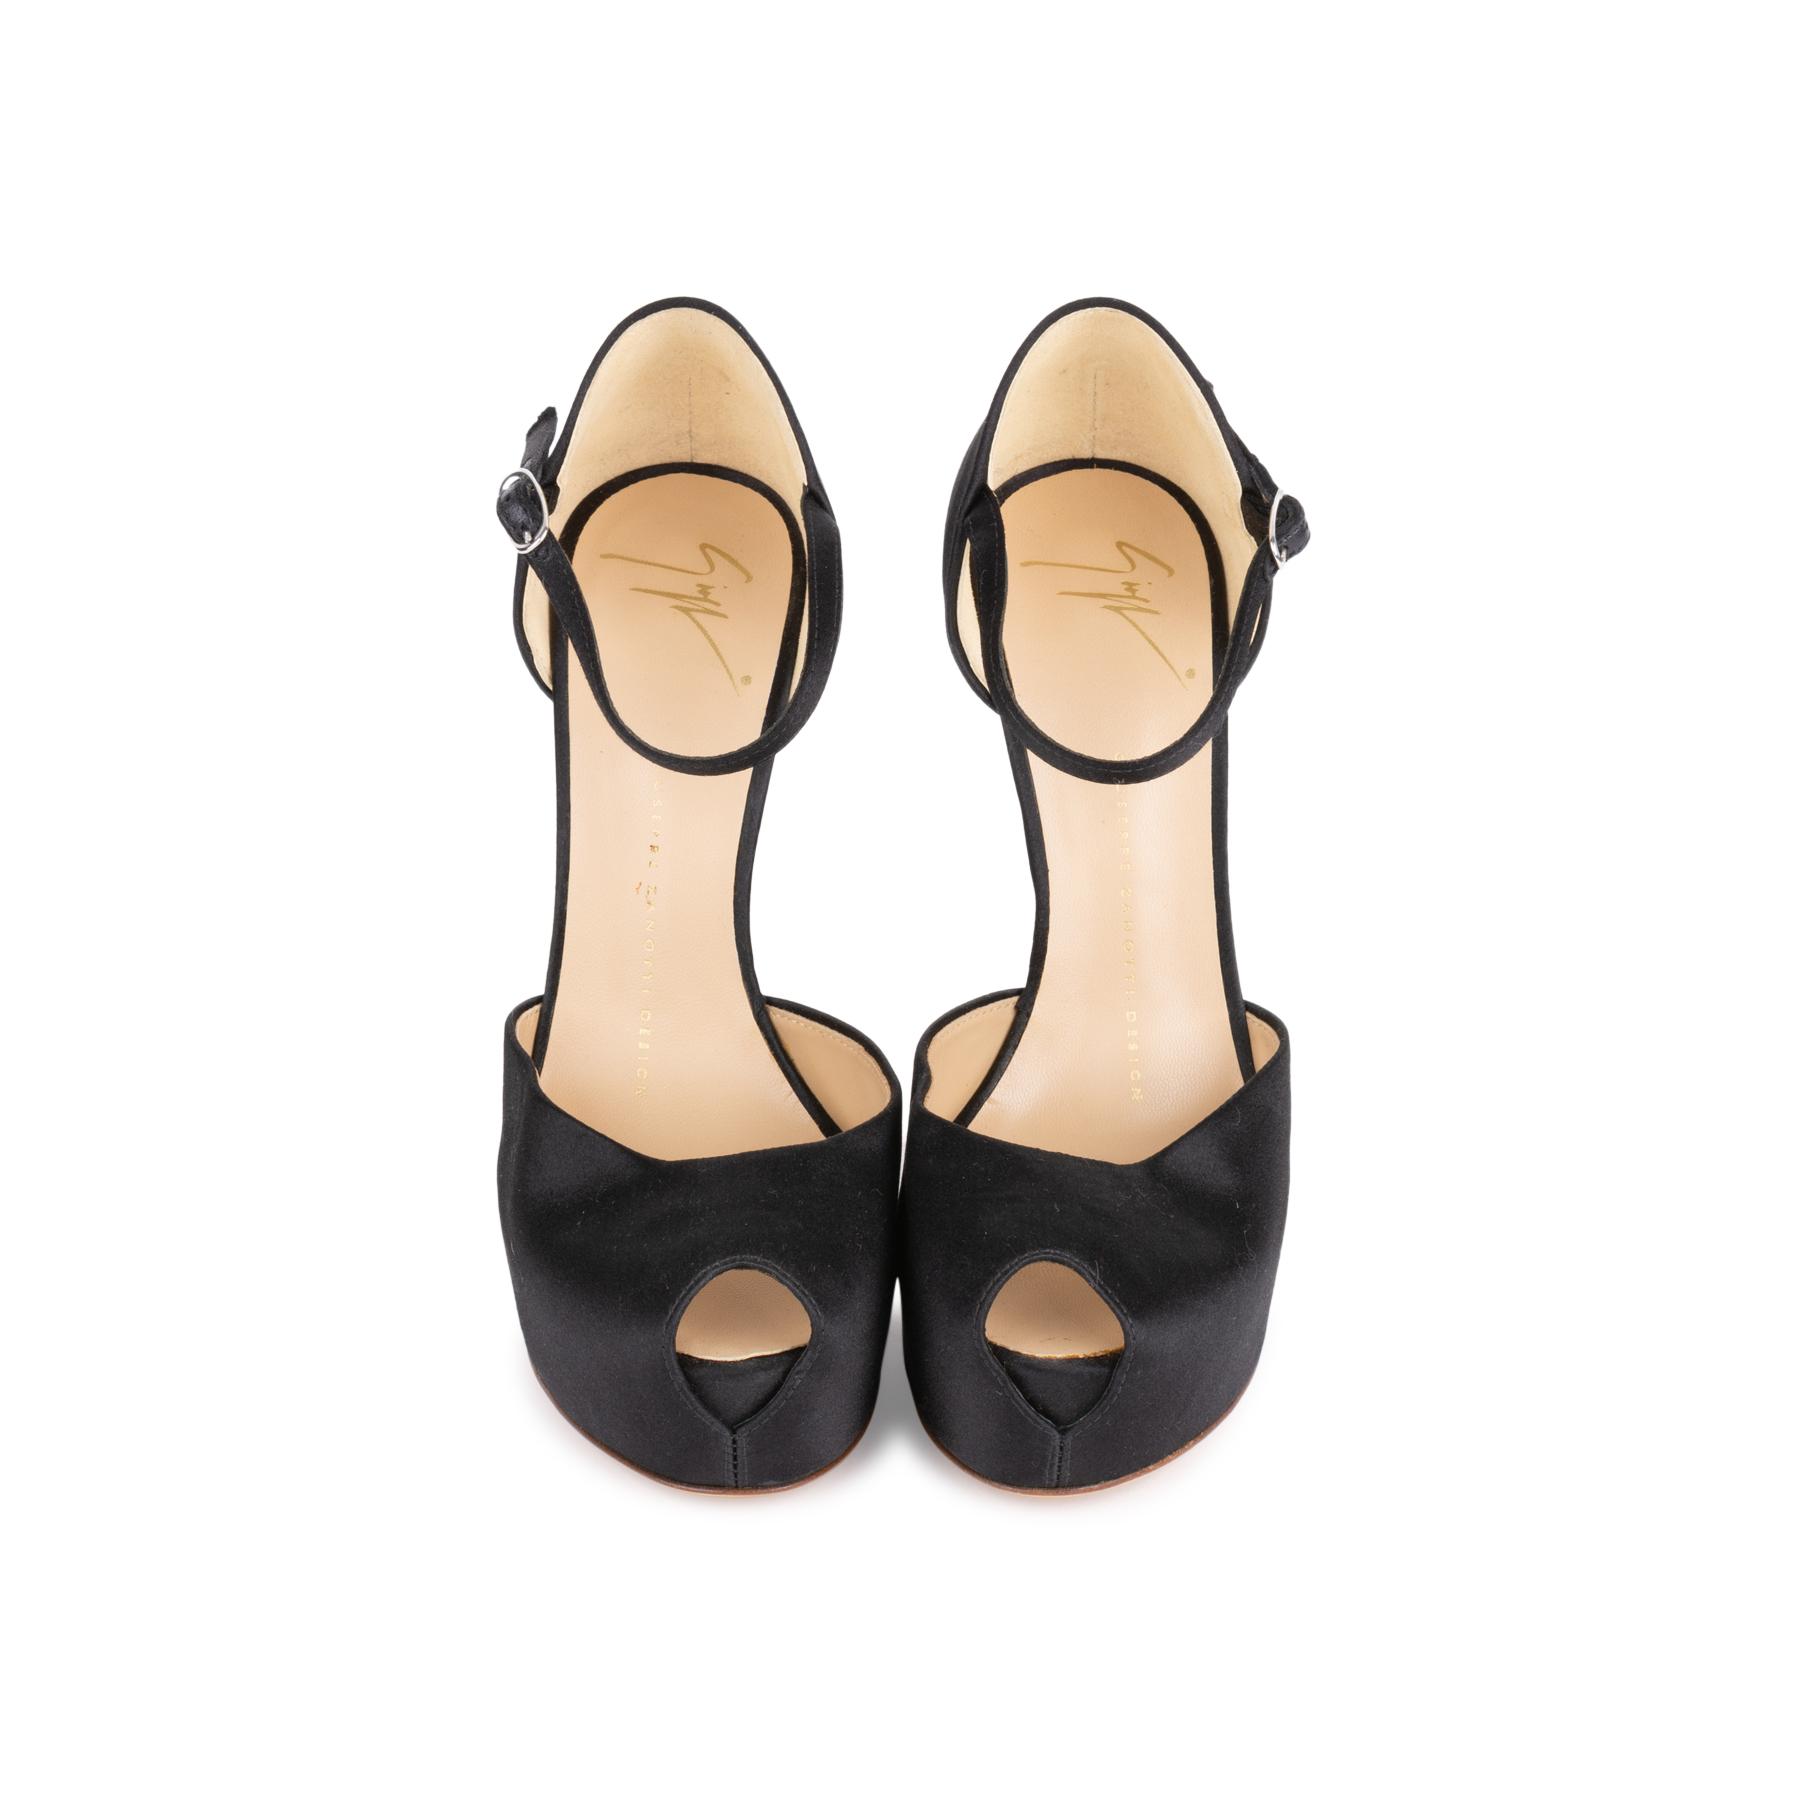 ee5f3de0b1f Authentic Second Hand Giuseppe Zanotti Black Satin Sandals (PSS-049-00077)